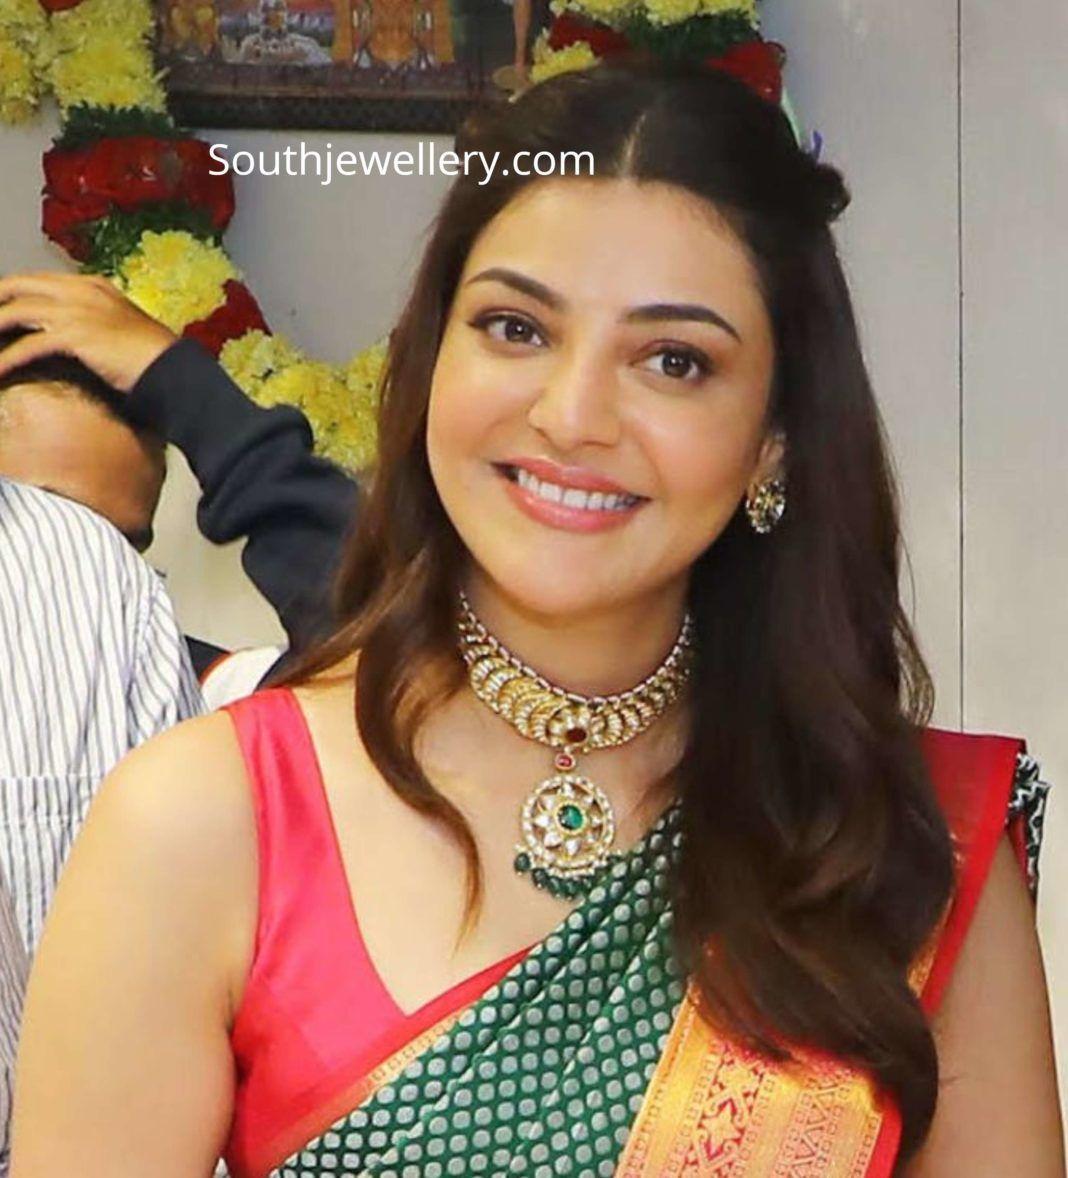 Kajal Aggarwal In A Kundan Choker And Studs Photo In 2020 Beautiful Indian Actress Indian Jewellery Design Beautiful Girl Indian